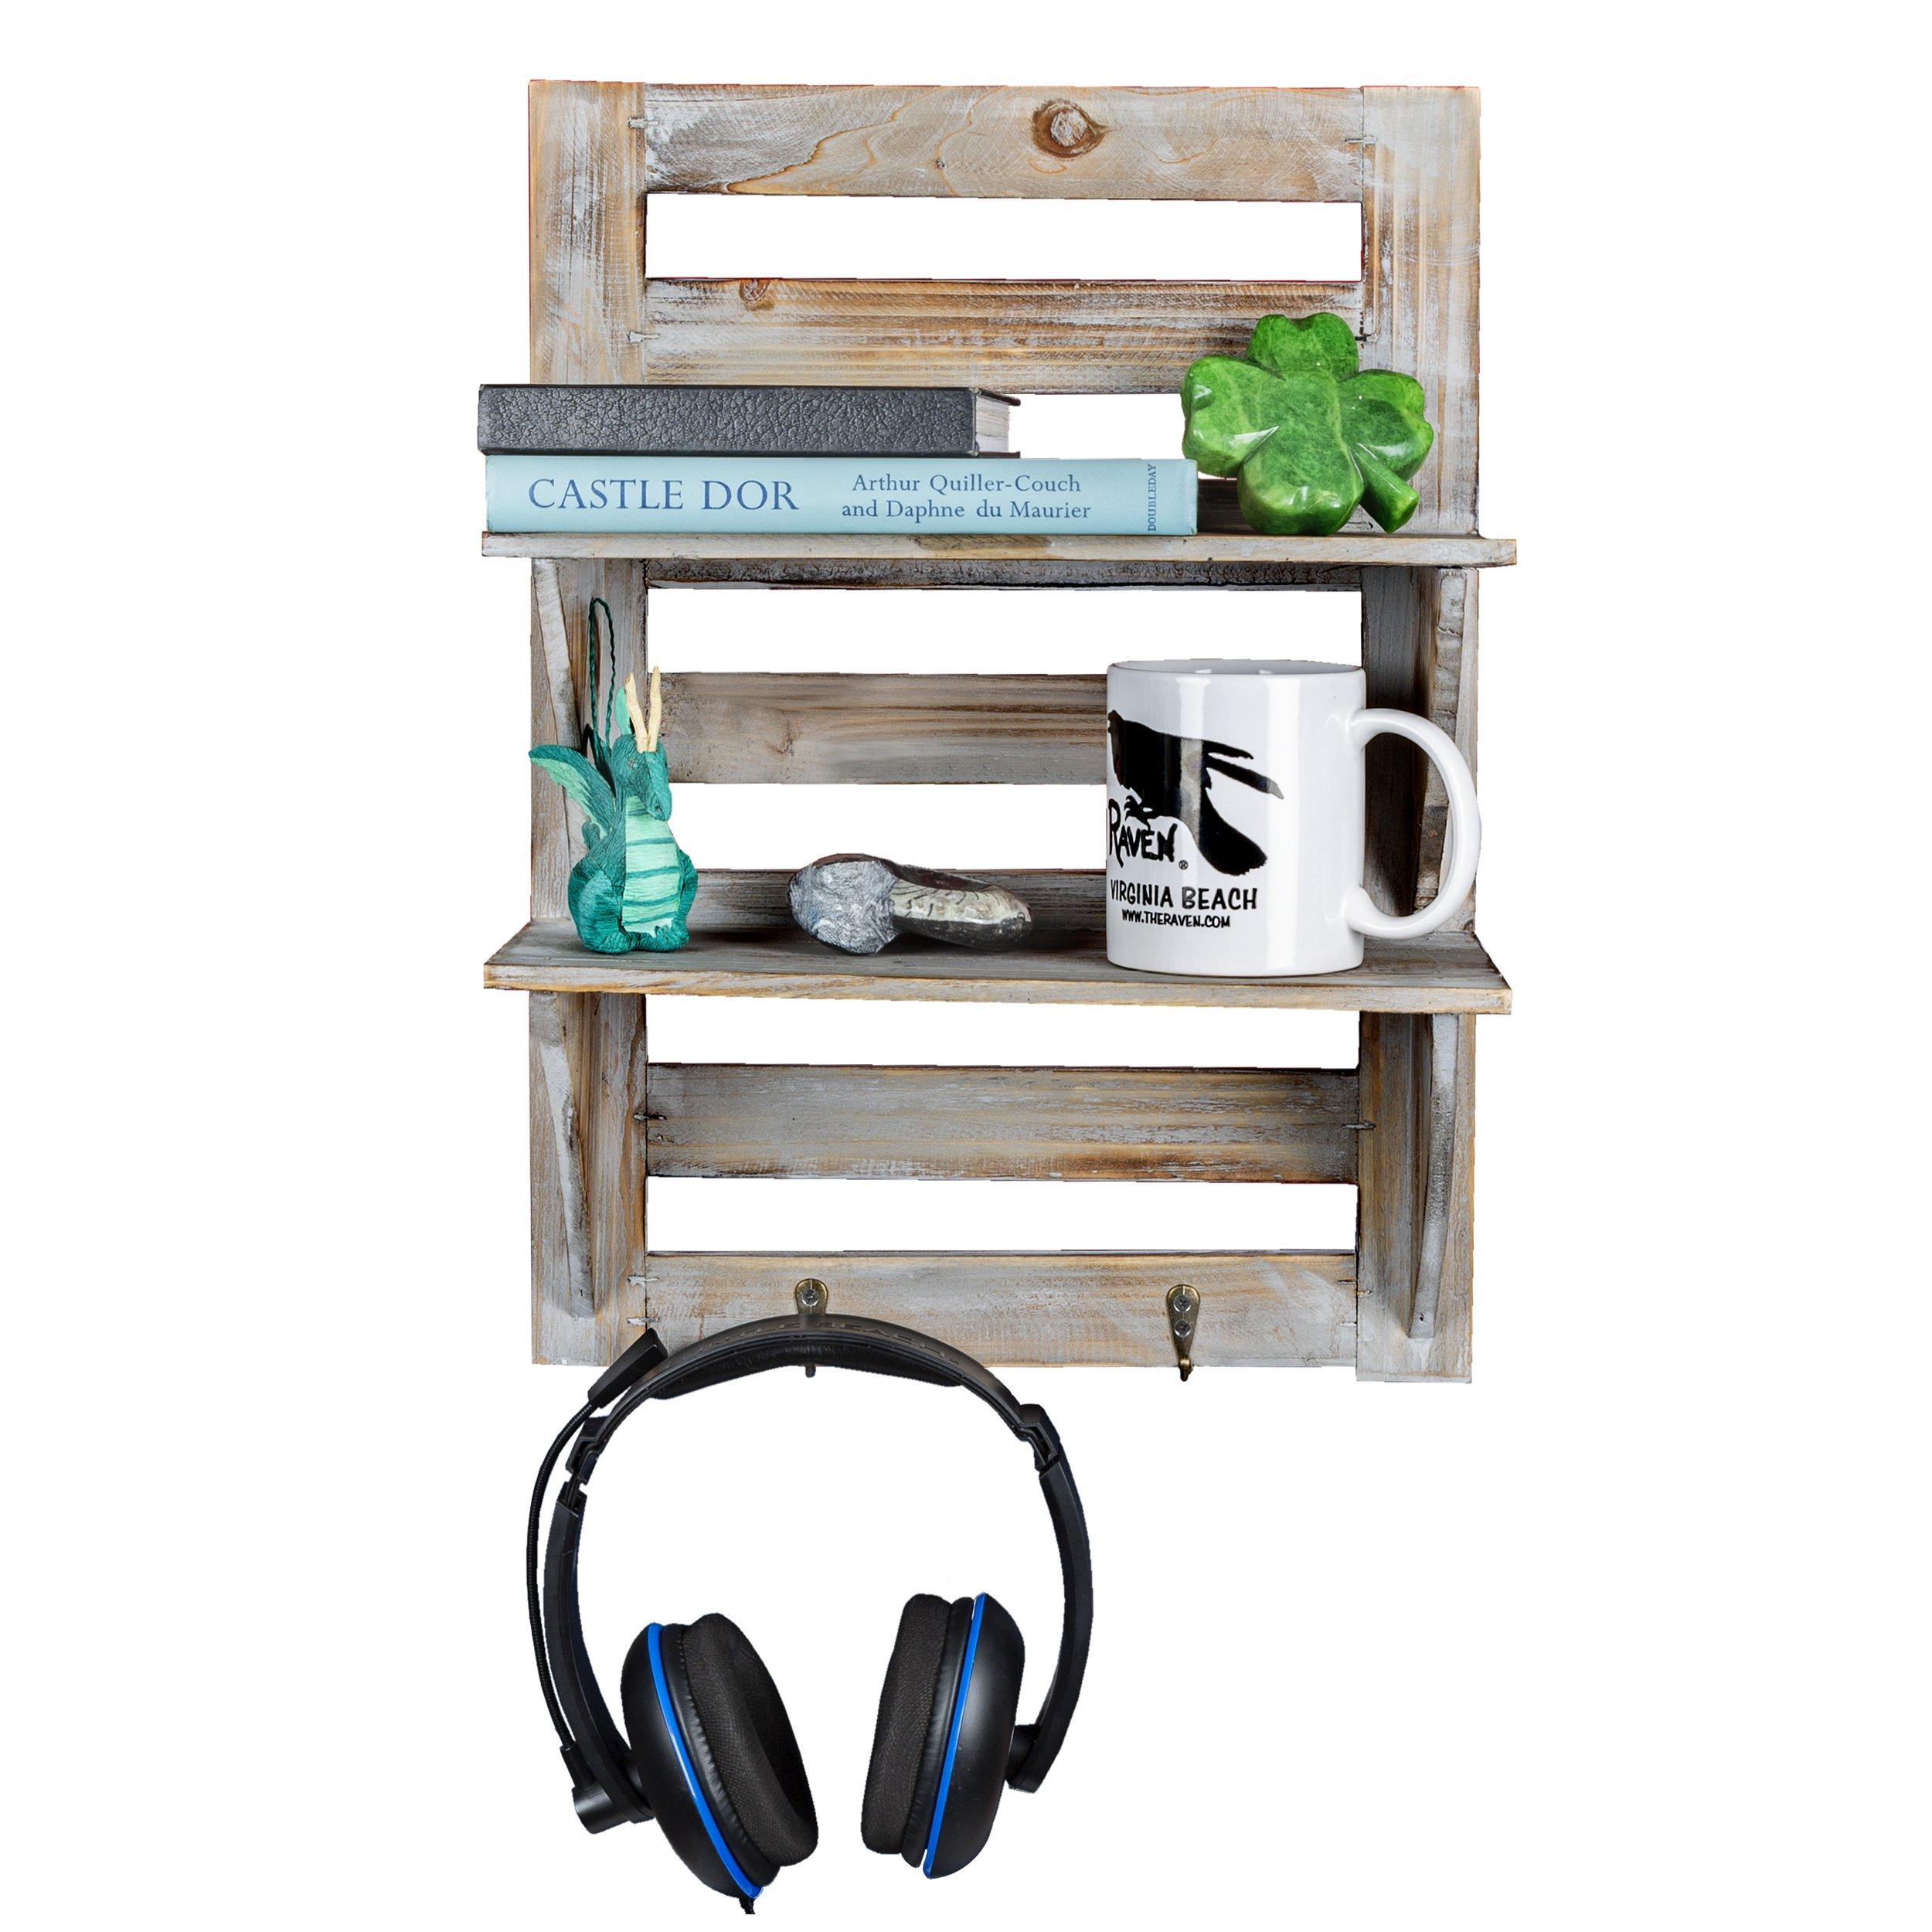 Besti Gift Organizer – Rustic Wood Wall Mounted Organizer– 2 Shelves Organizer with 2 Hooks – 2 Tier Storage Rack Brown – Cute Rustic Organizers – Home Decorative Furniture